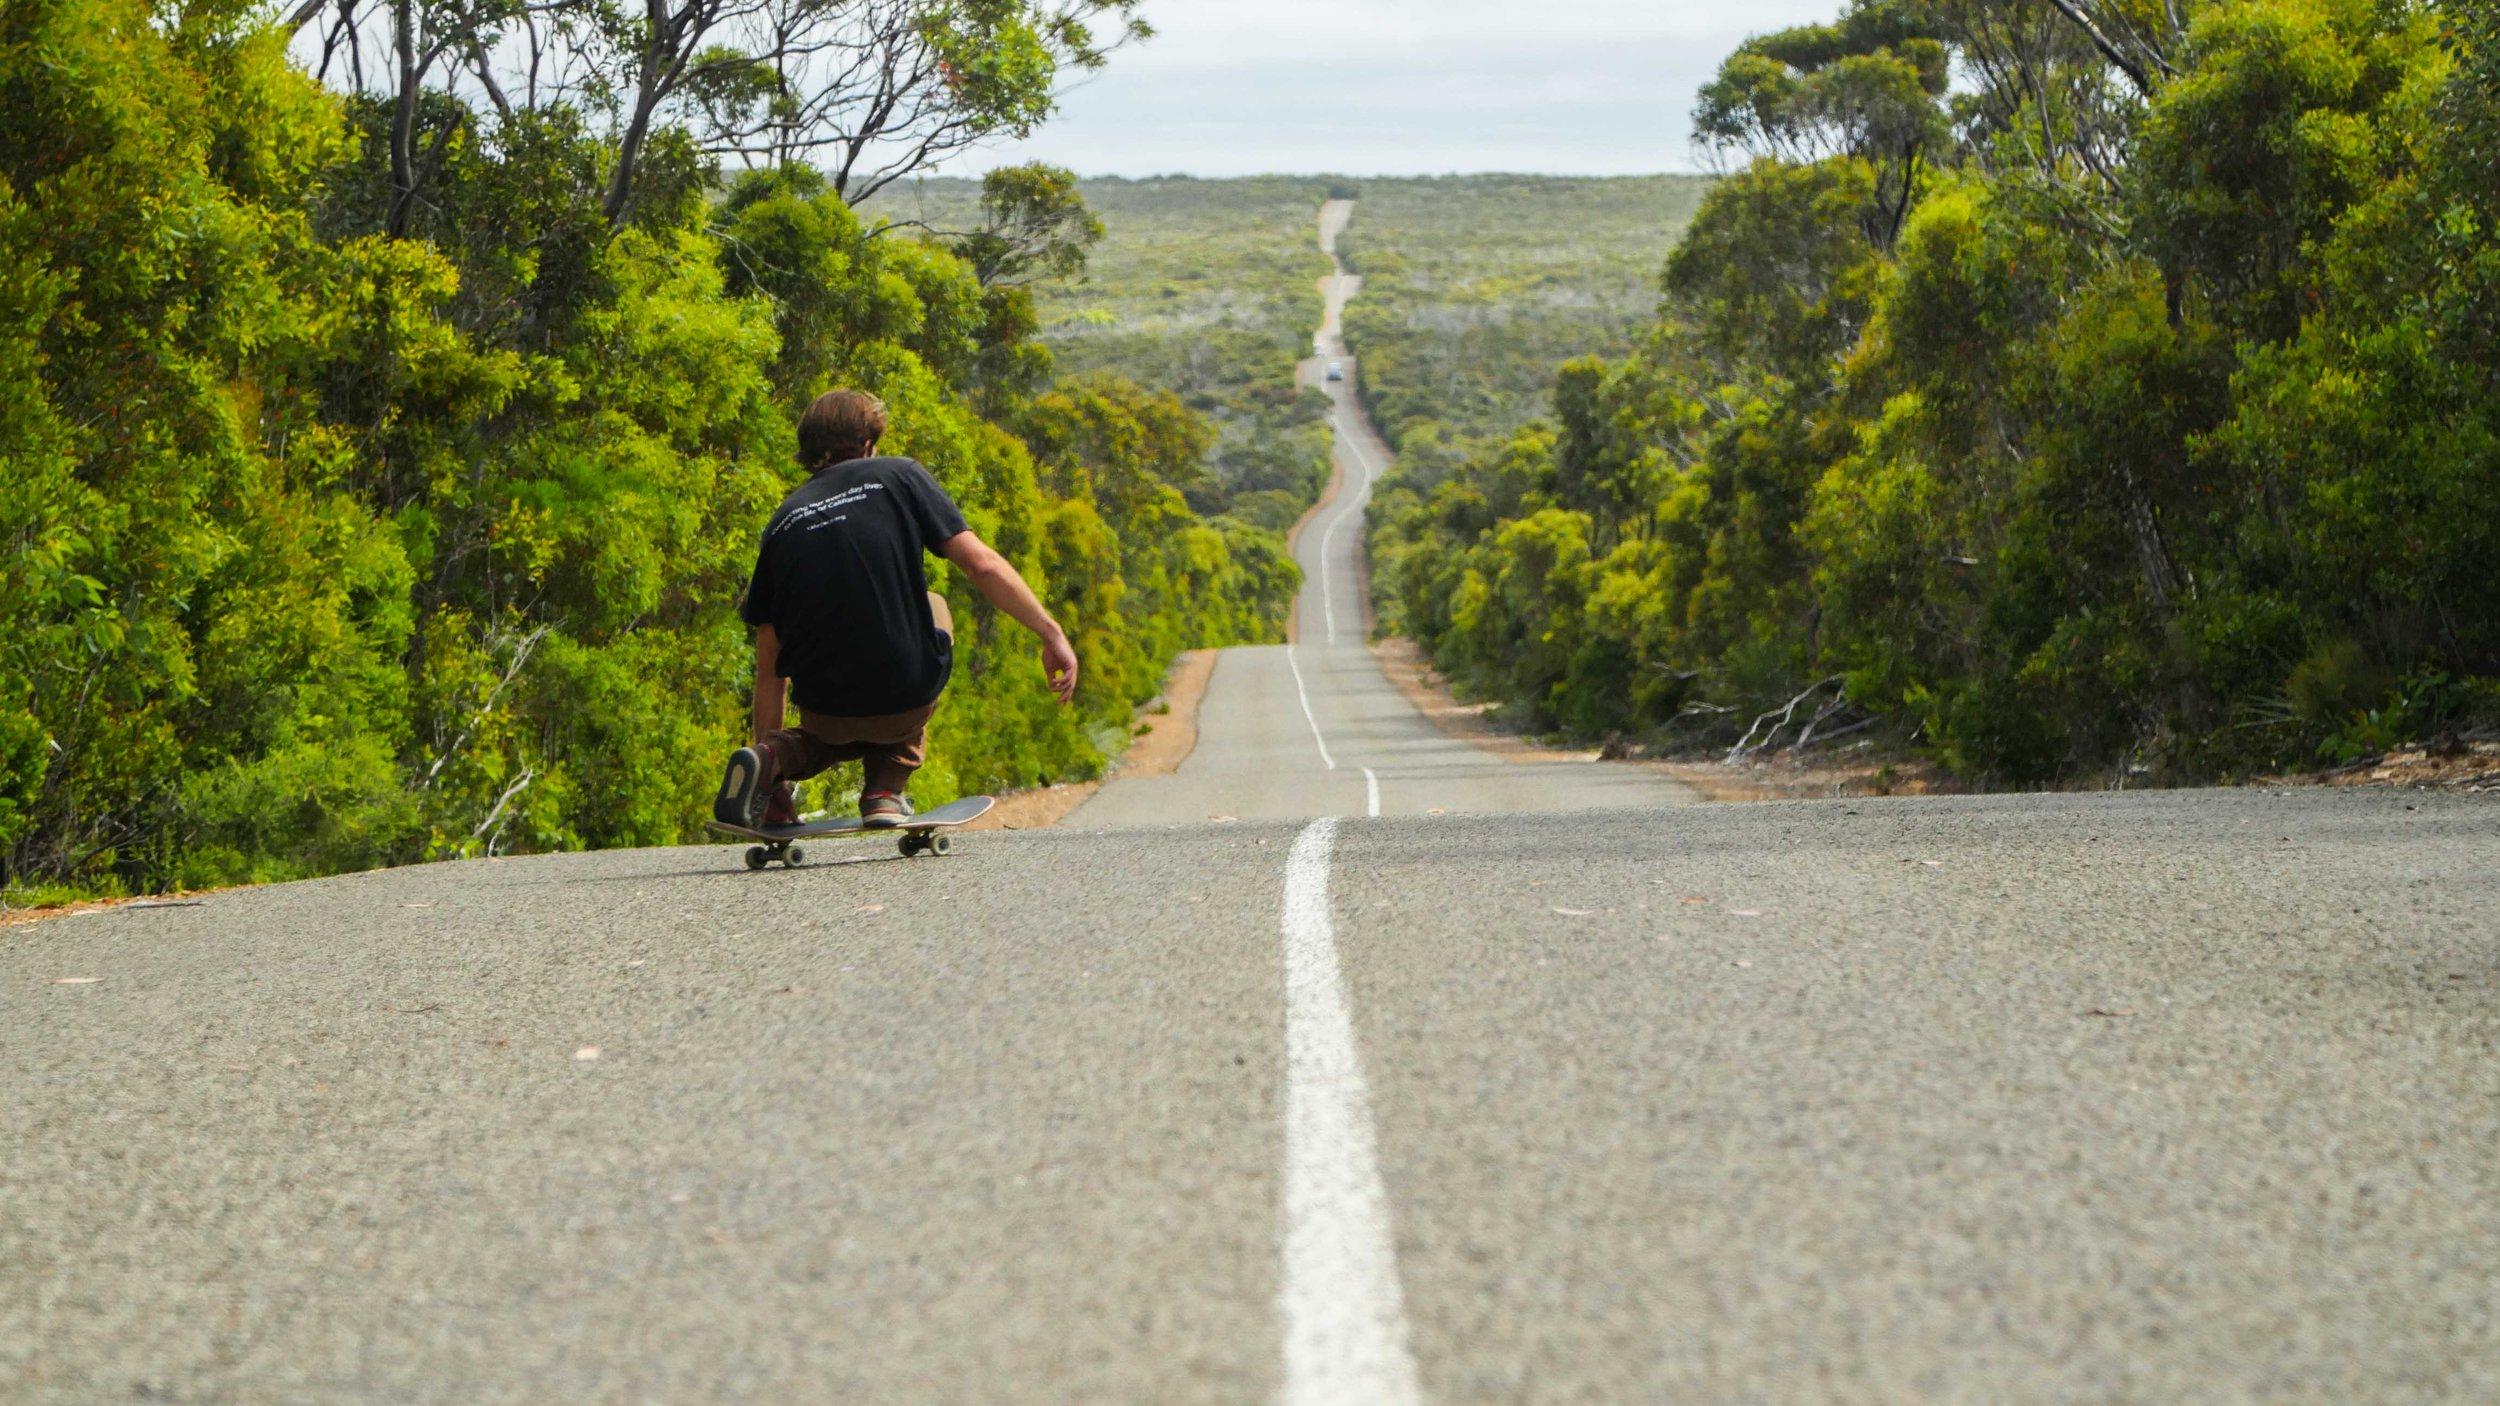 kangaroo island south australia (8 of 16).jpg